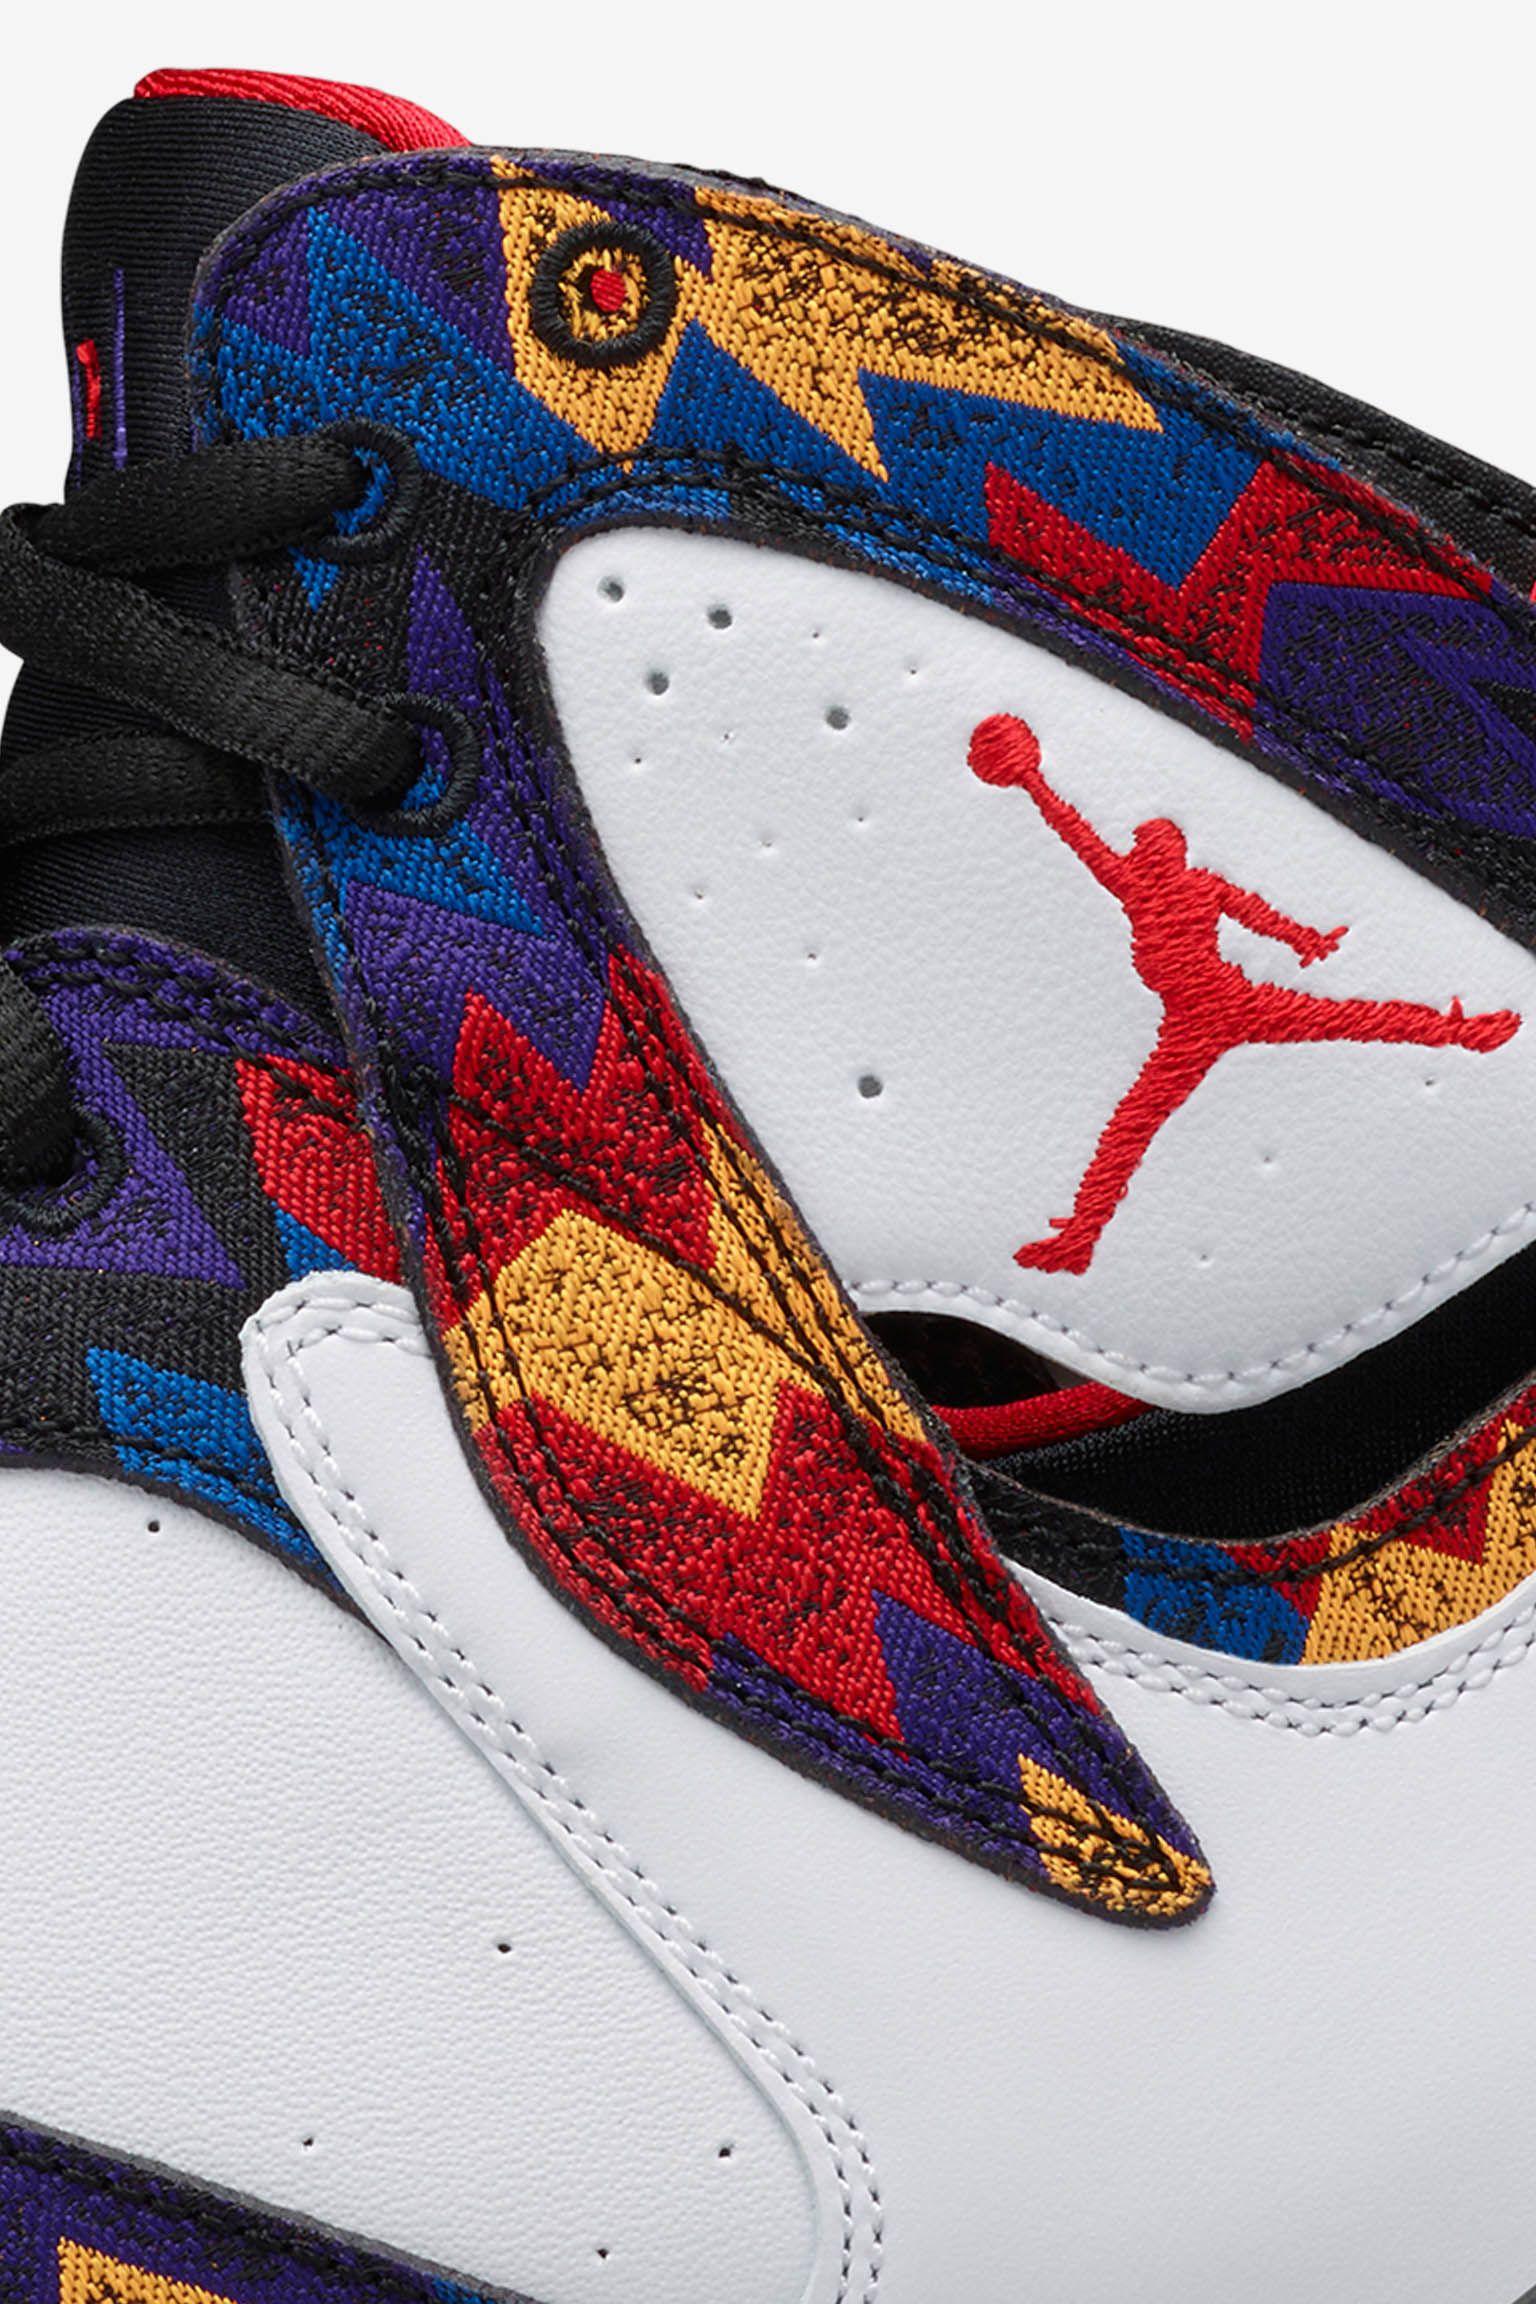 Air Jordan 7 Retro 'Bright Concord' Release Date